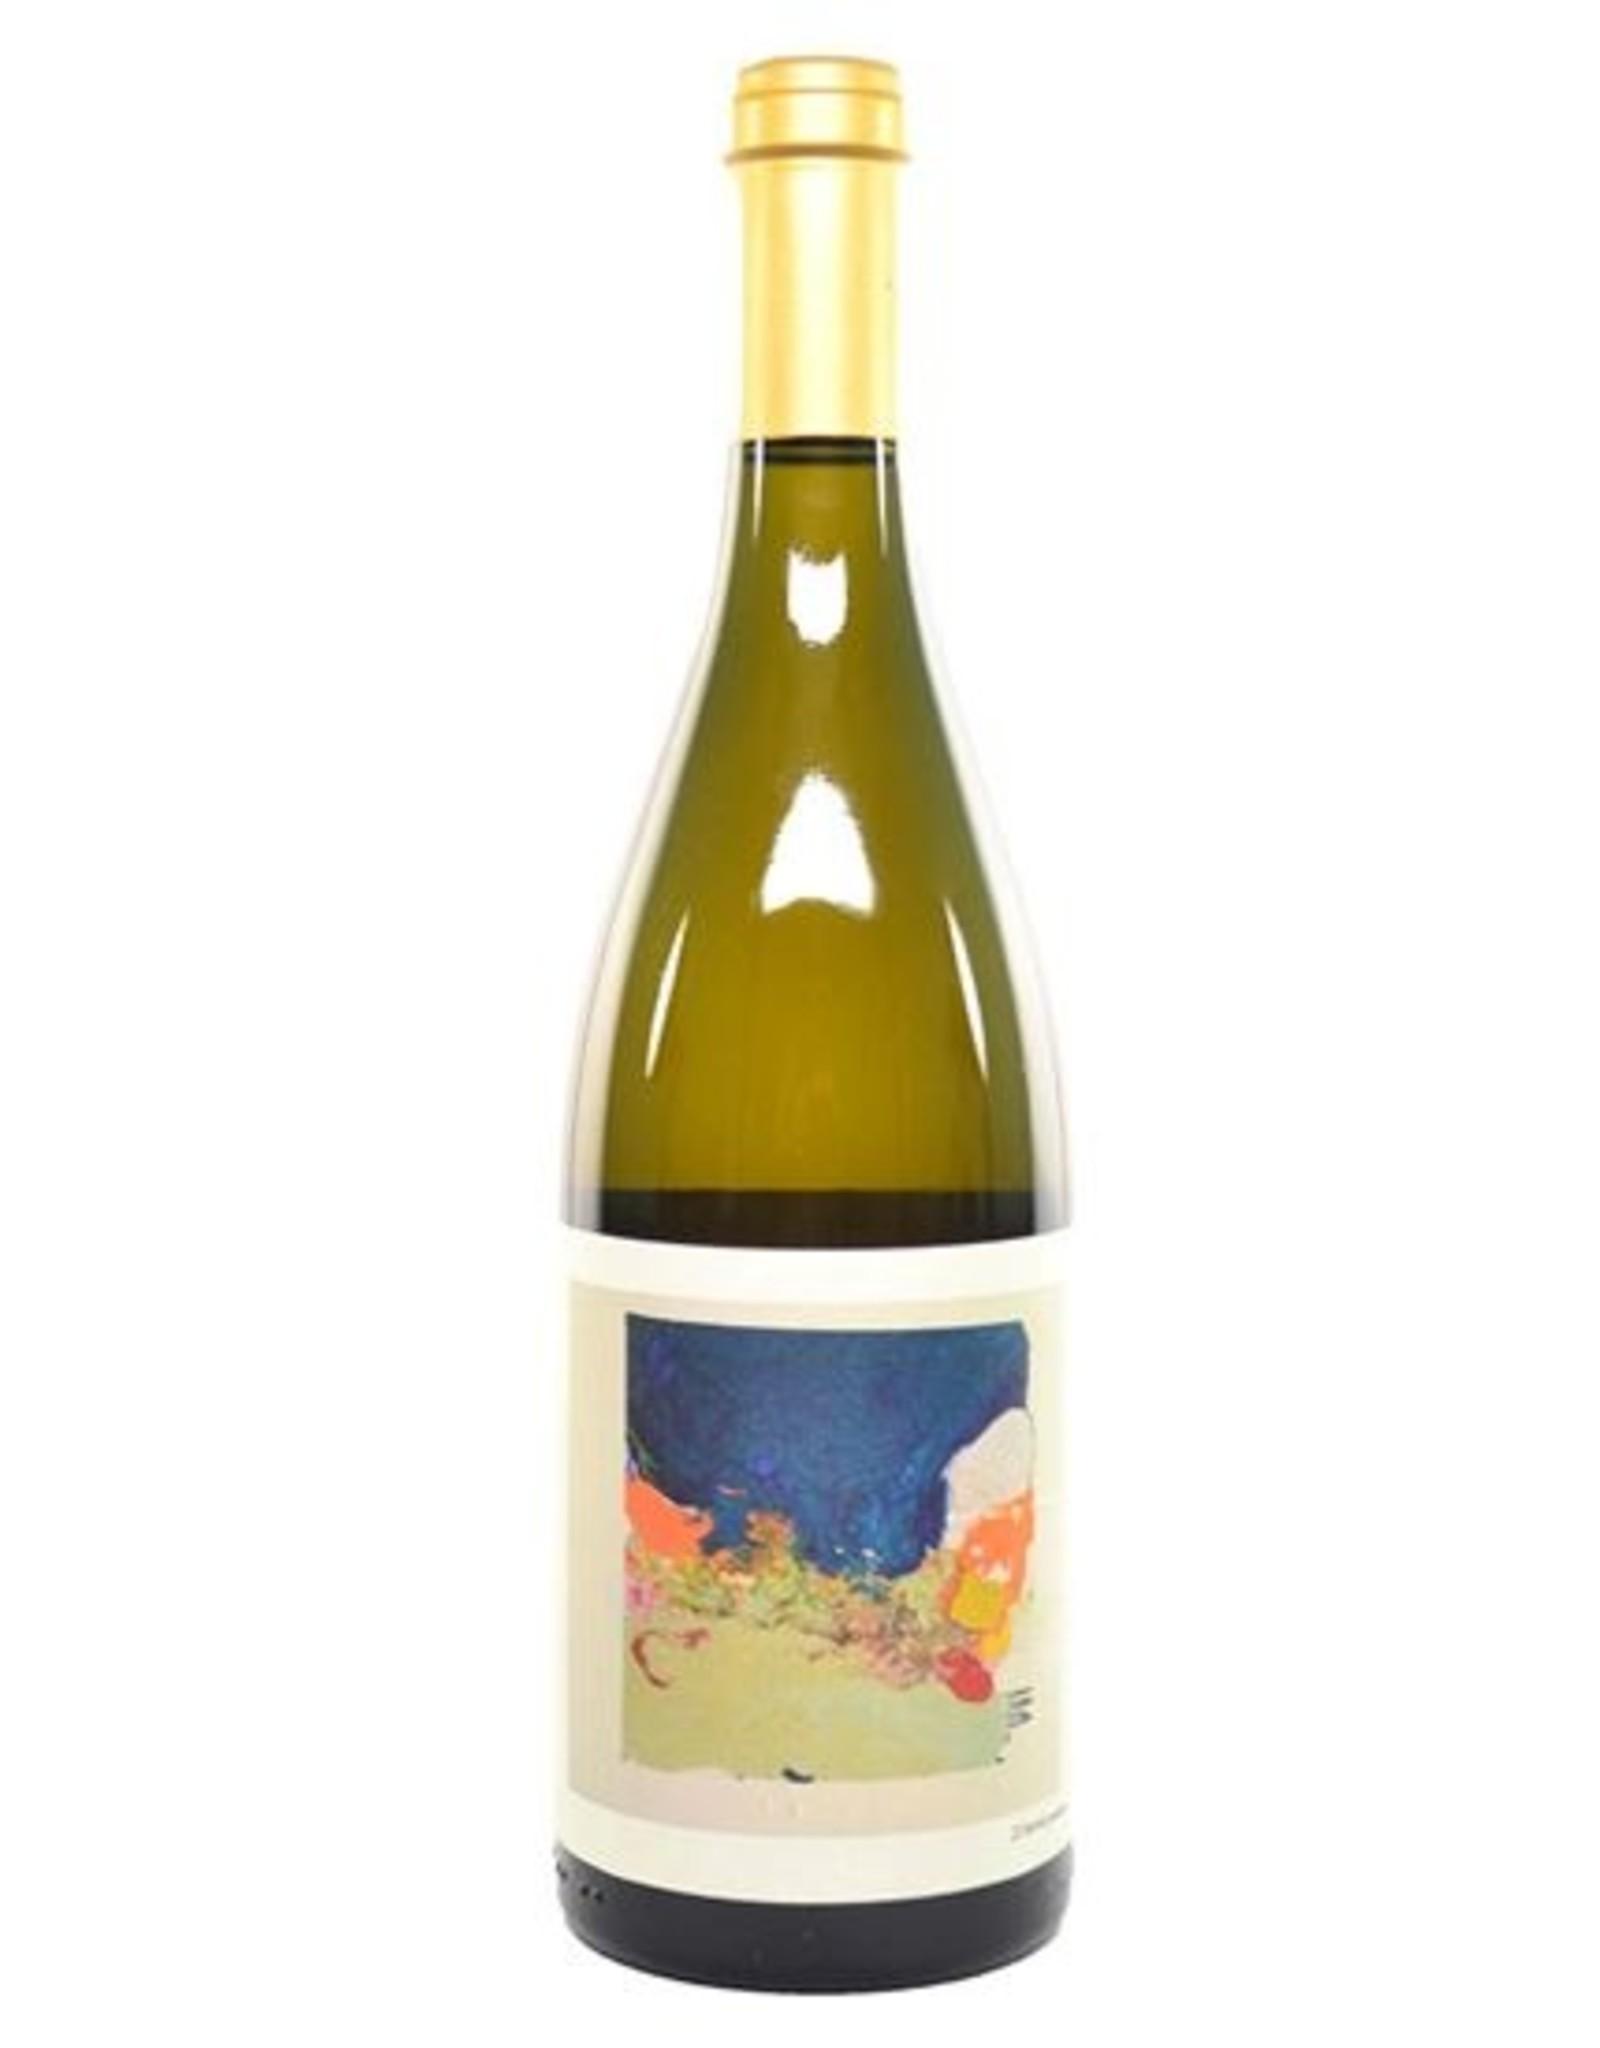 Chanin Bien Nacido Chardonnay